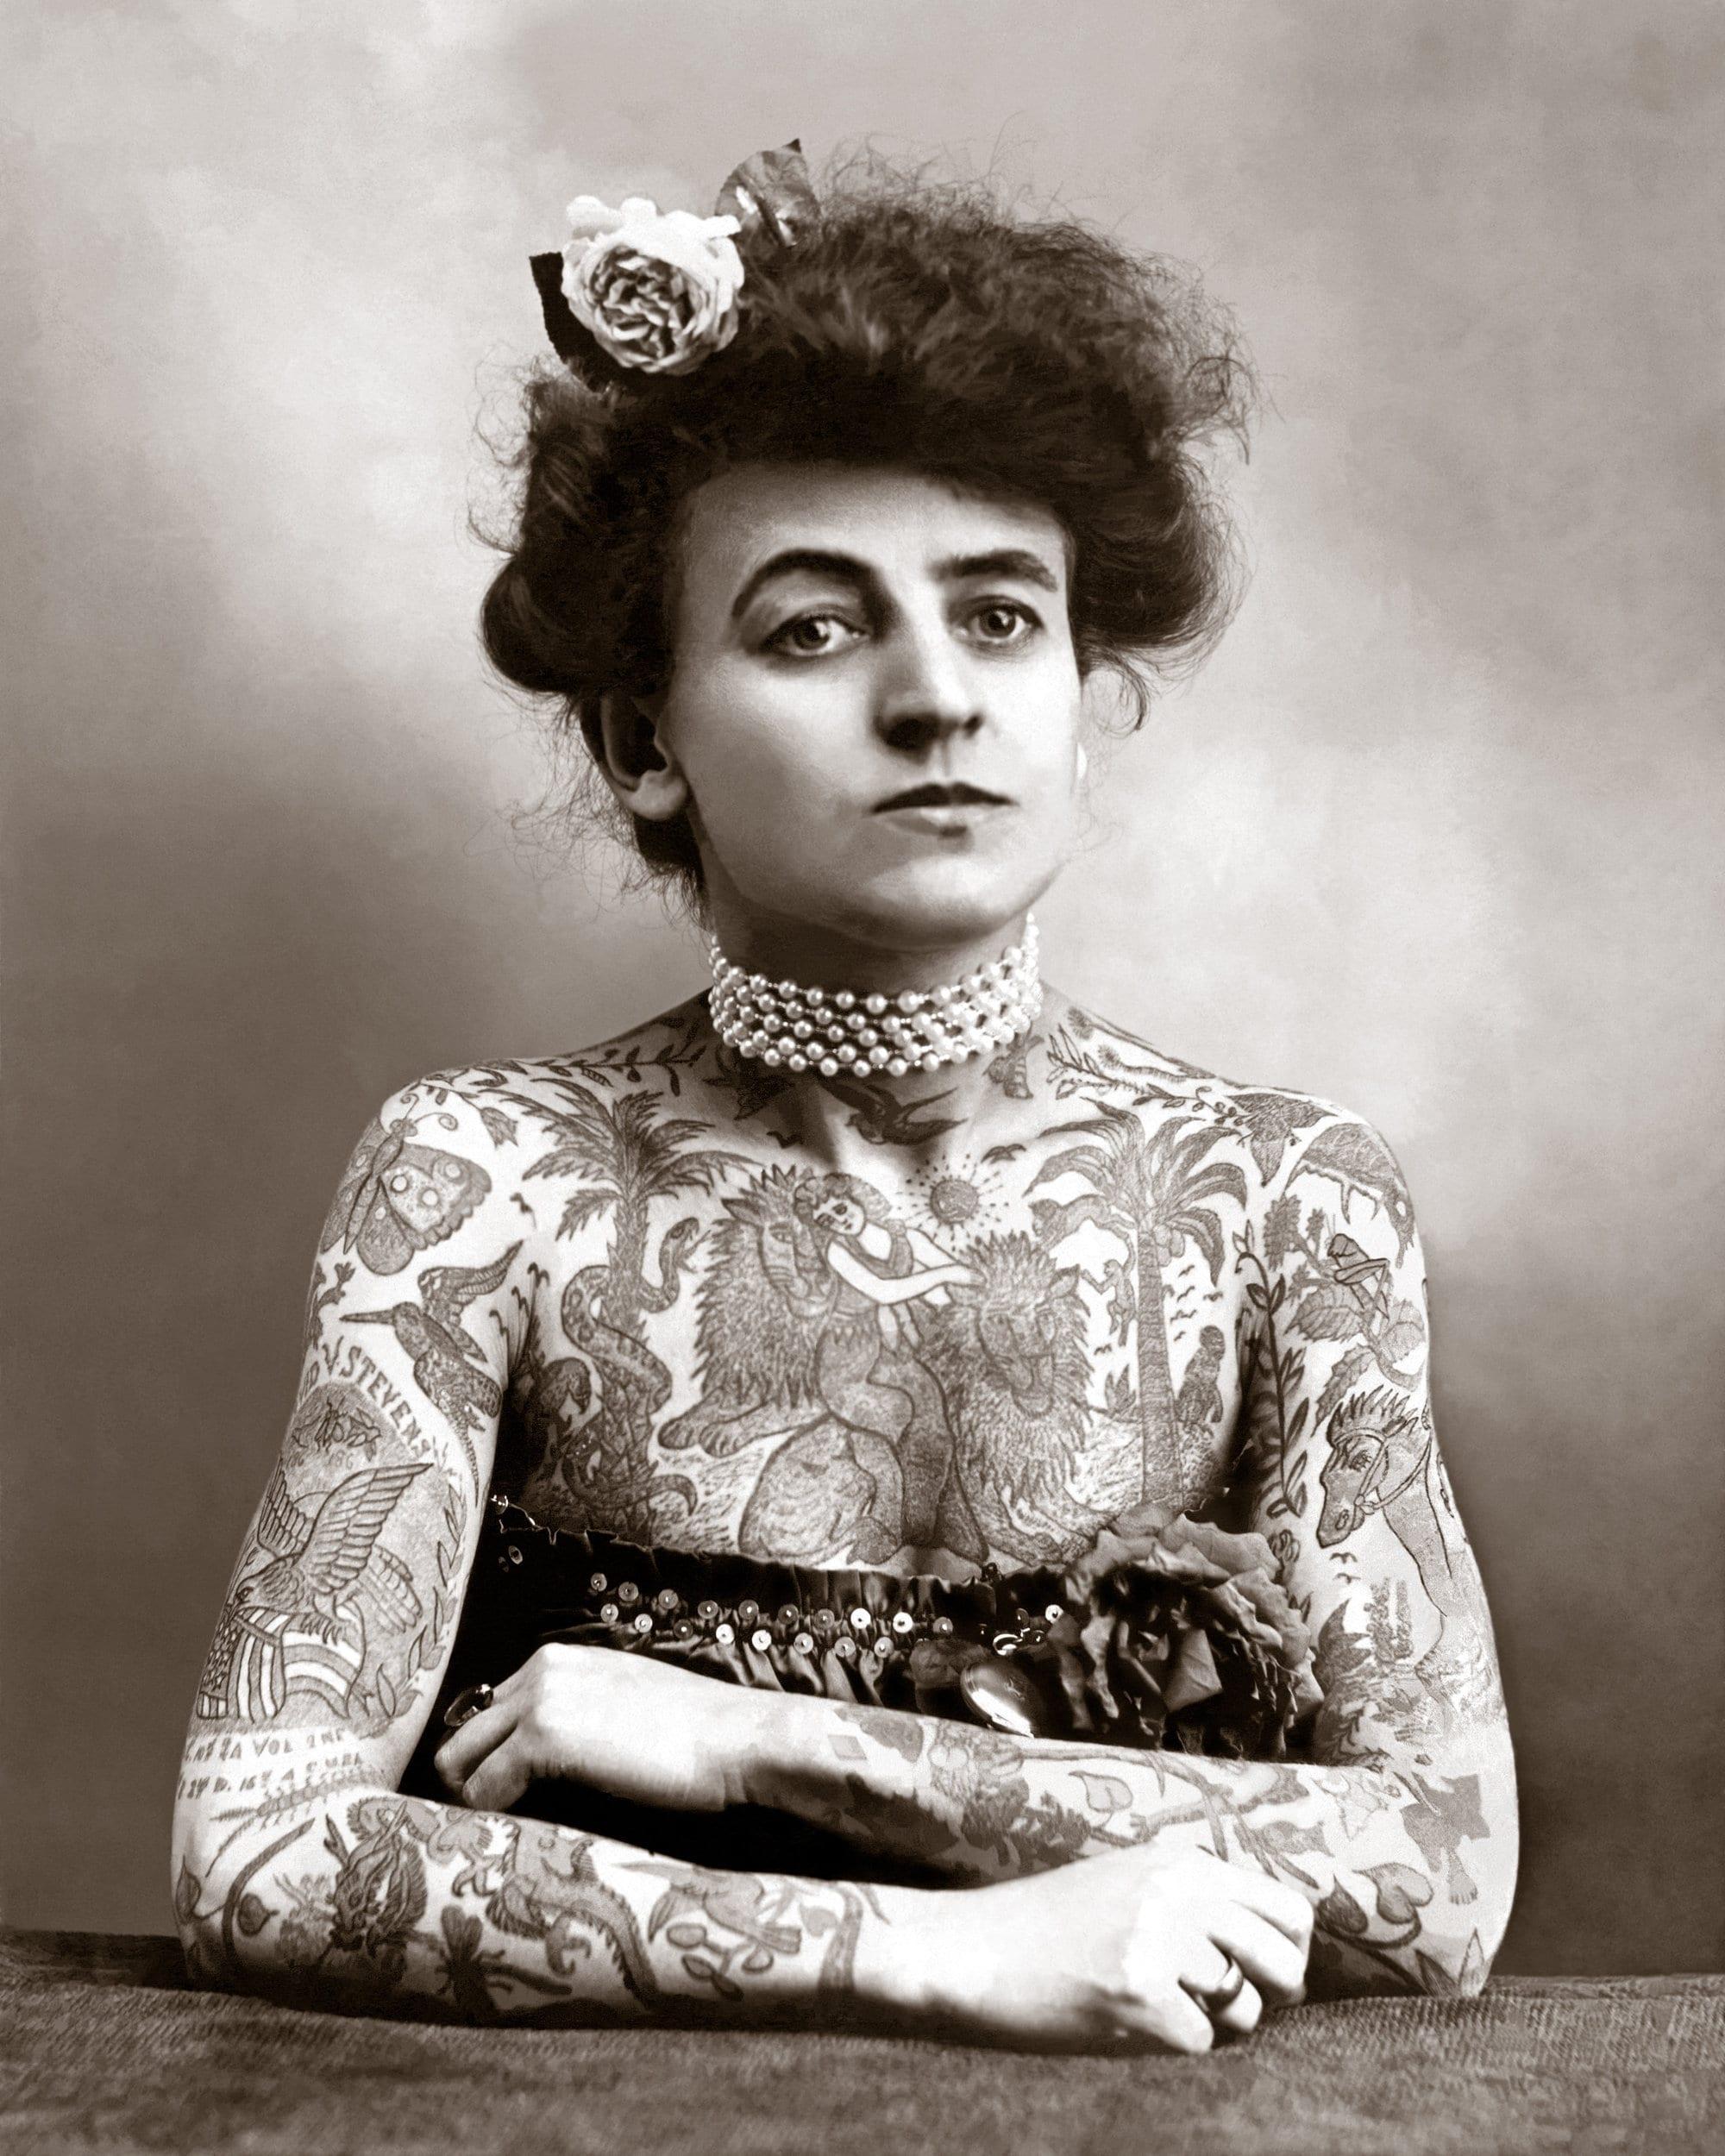 Unframed Poster or Canvas Tattooed Lady Bizarre Strange Weird Vintage Photo